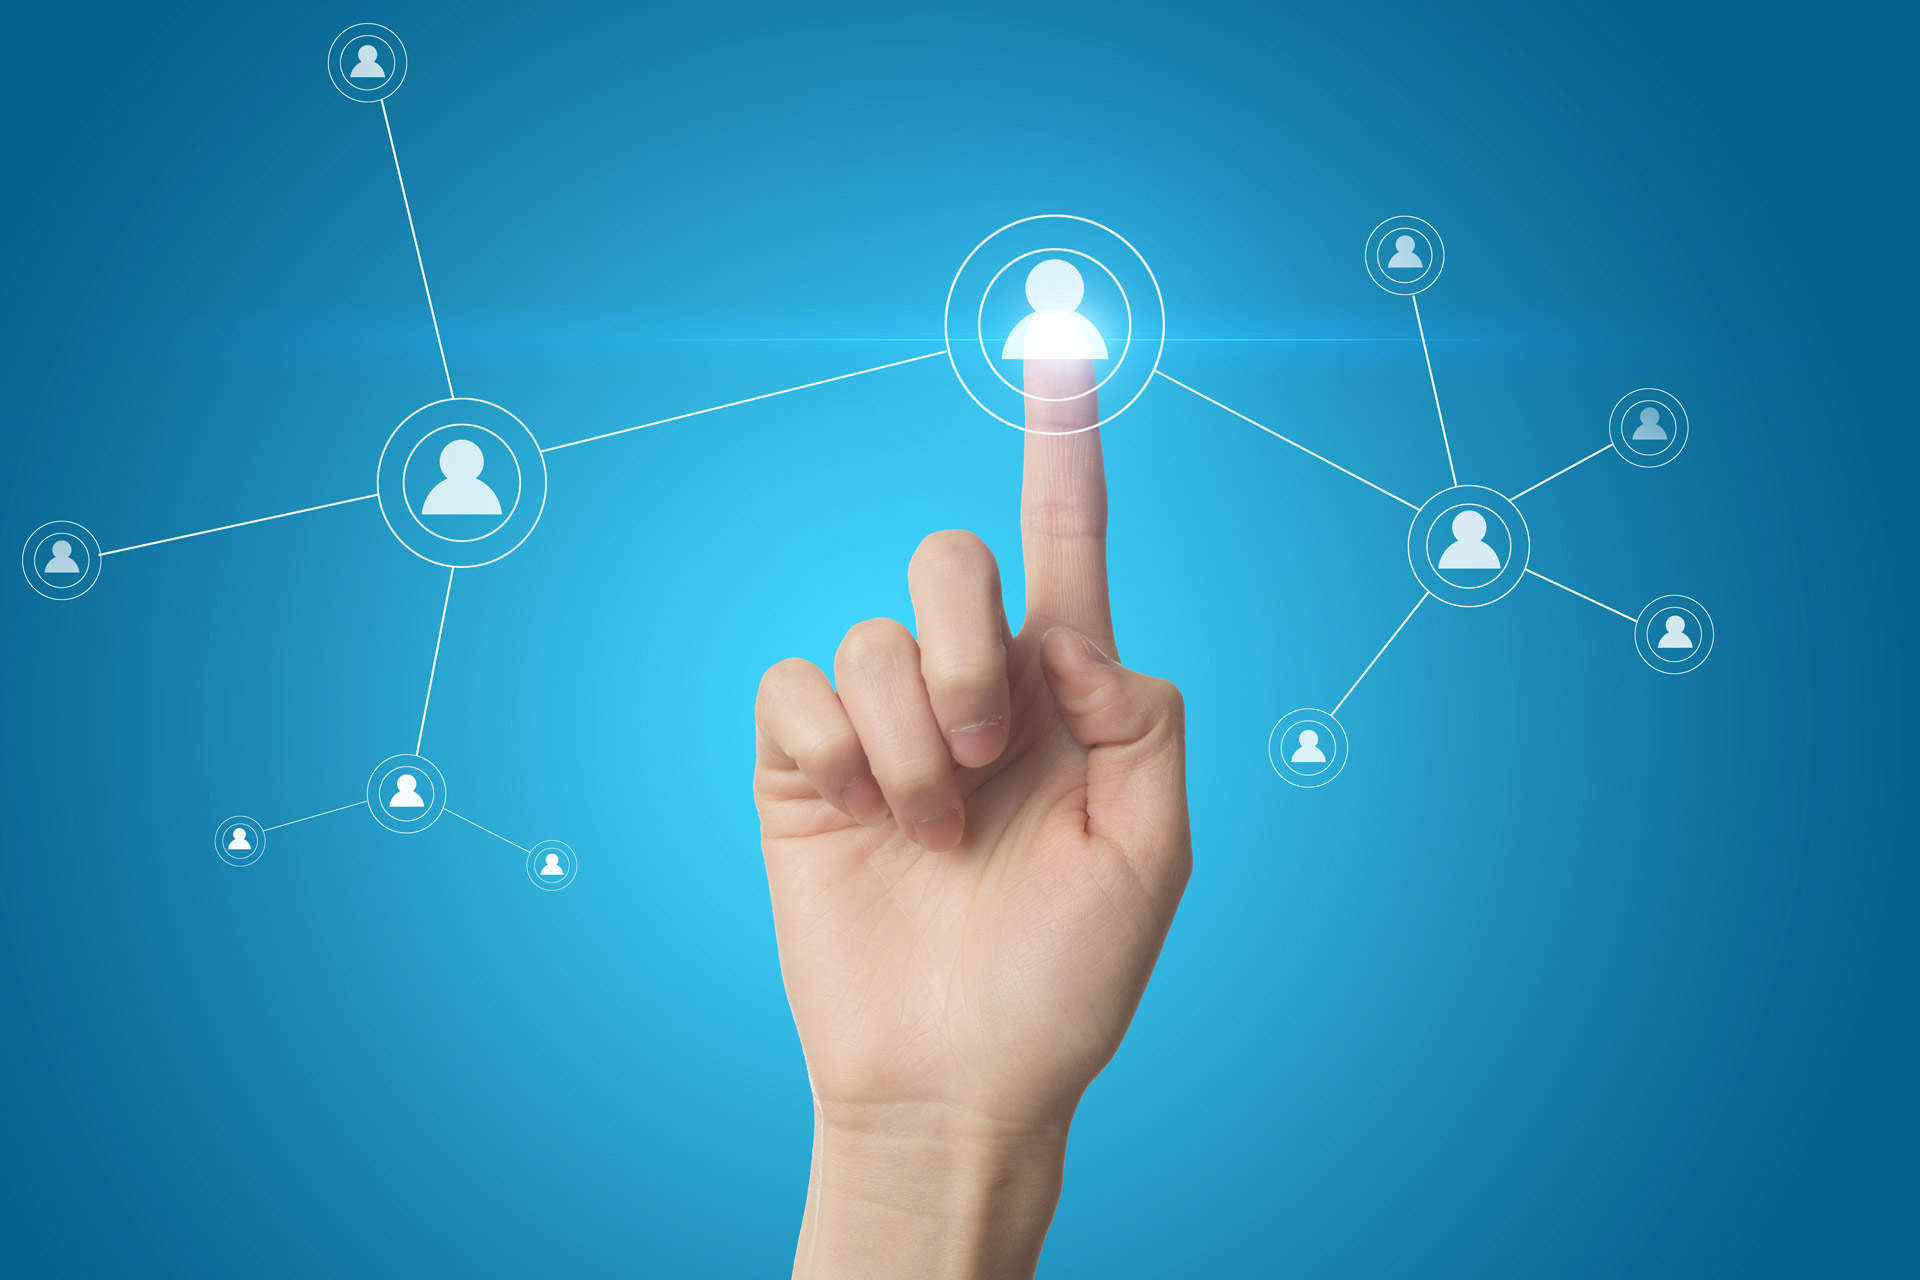 Assistenza remota in rete: come usare teamviewer